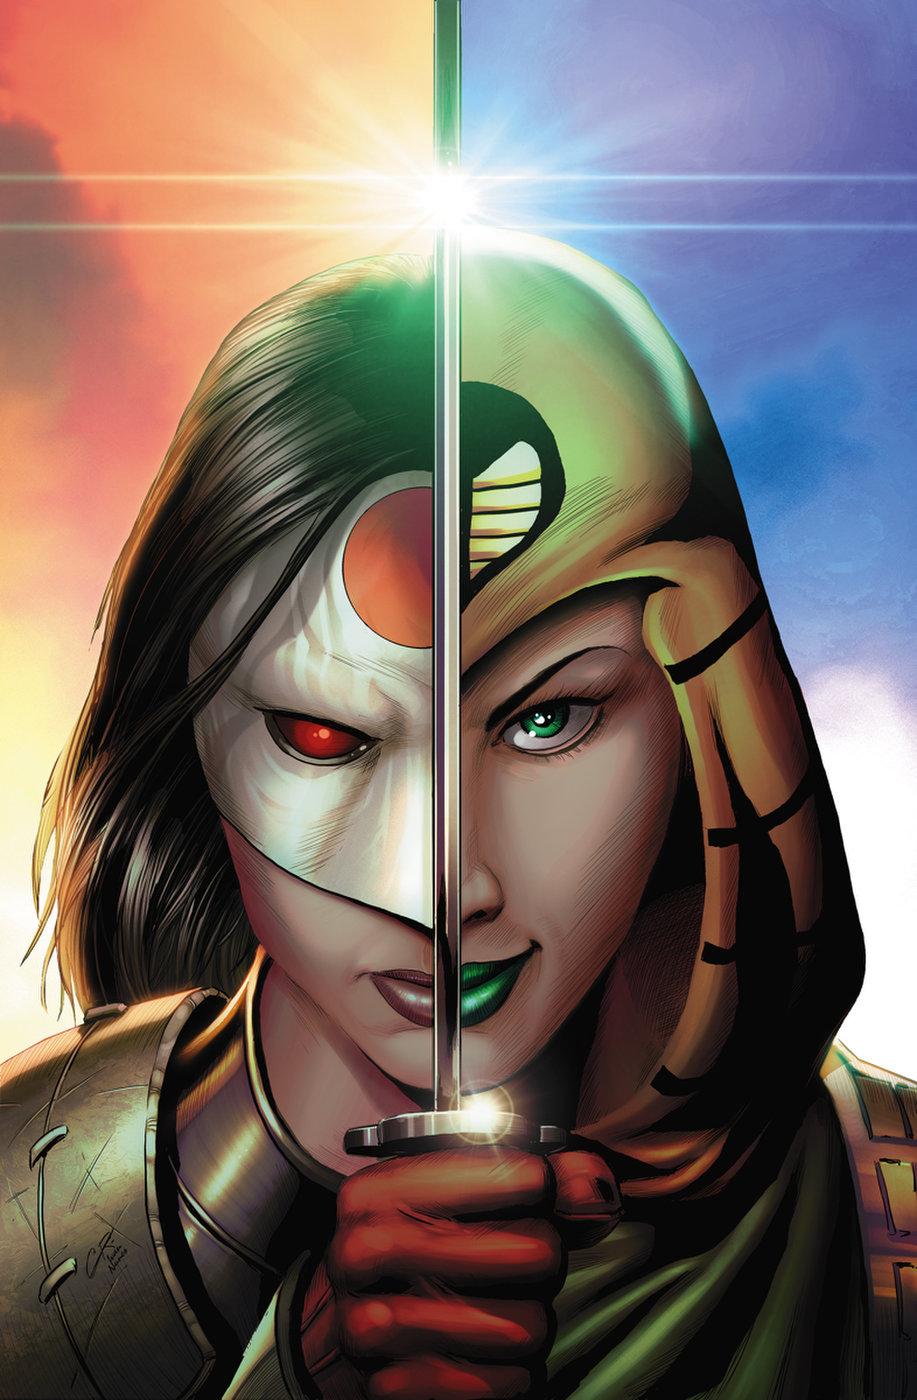 Suicide Squad Black Files 2 - Katana: Revenge of Kobra 2